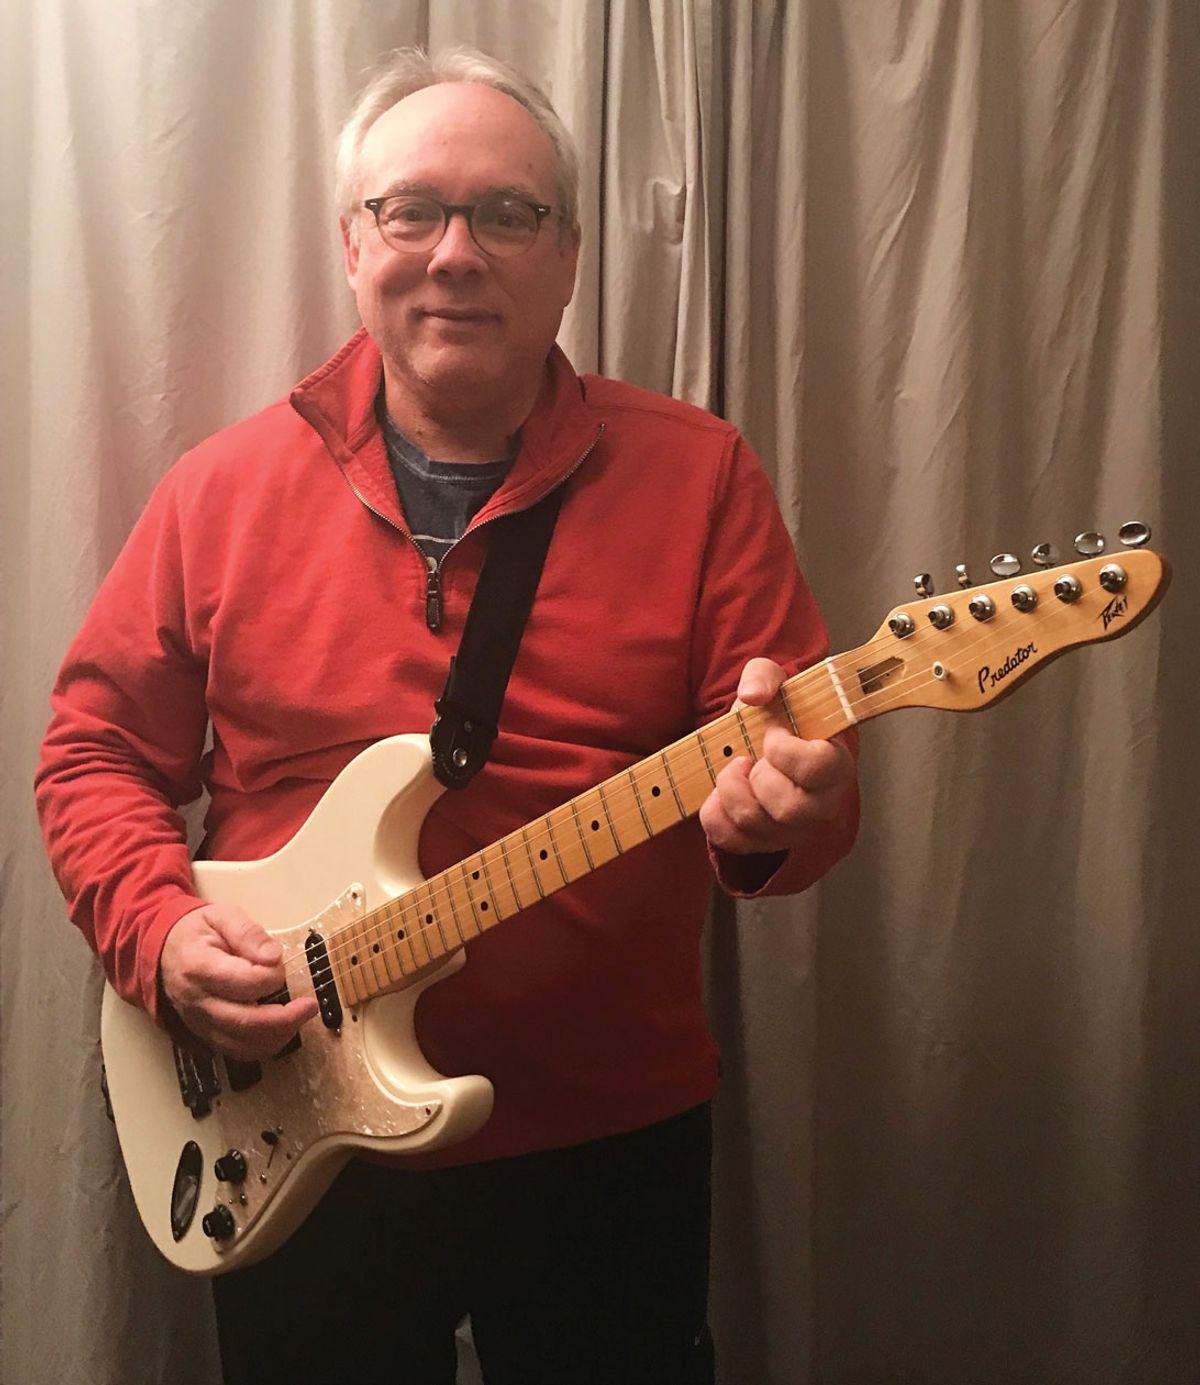 Reader Guitar of the Month: Peavey Predator